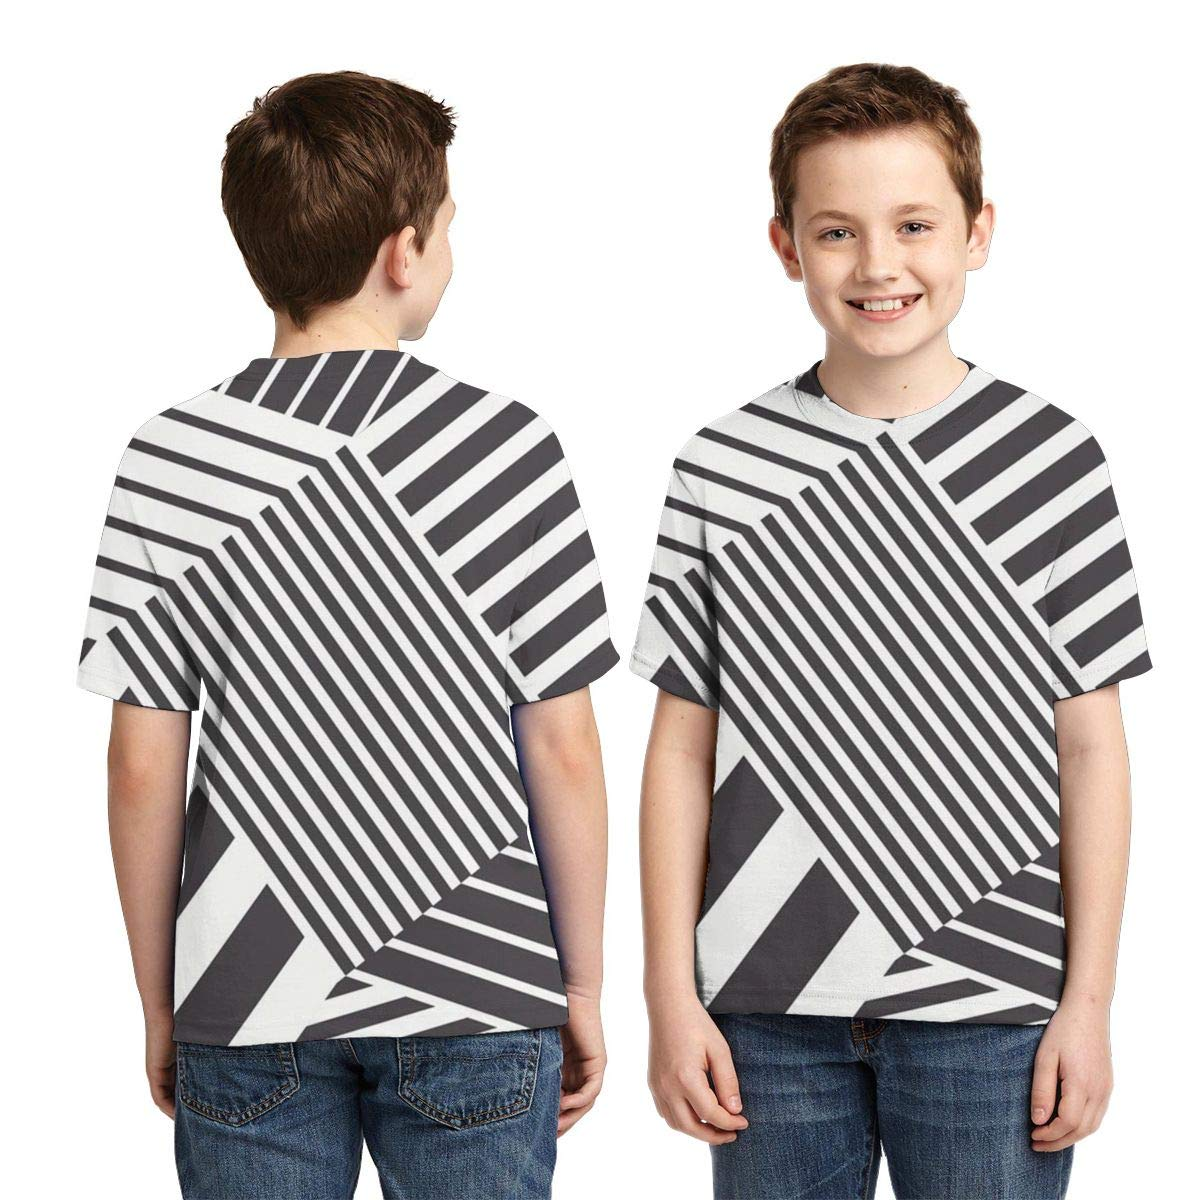 HHTZTCL Black and White Stripes Boys Print Graphic Tee Short Sleeve T-Shirt